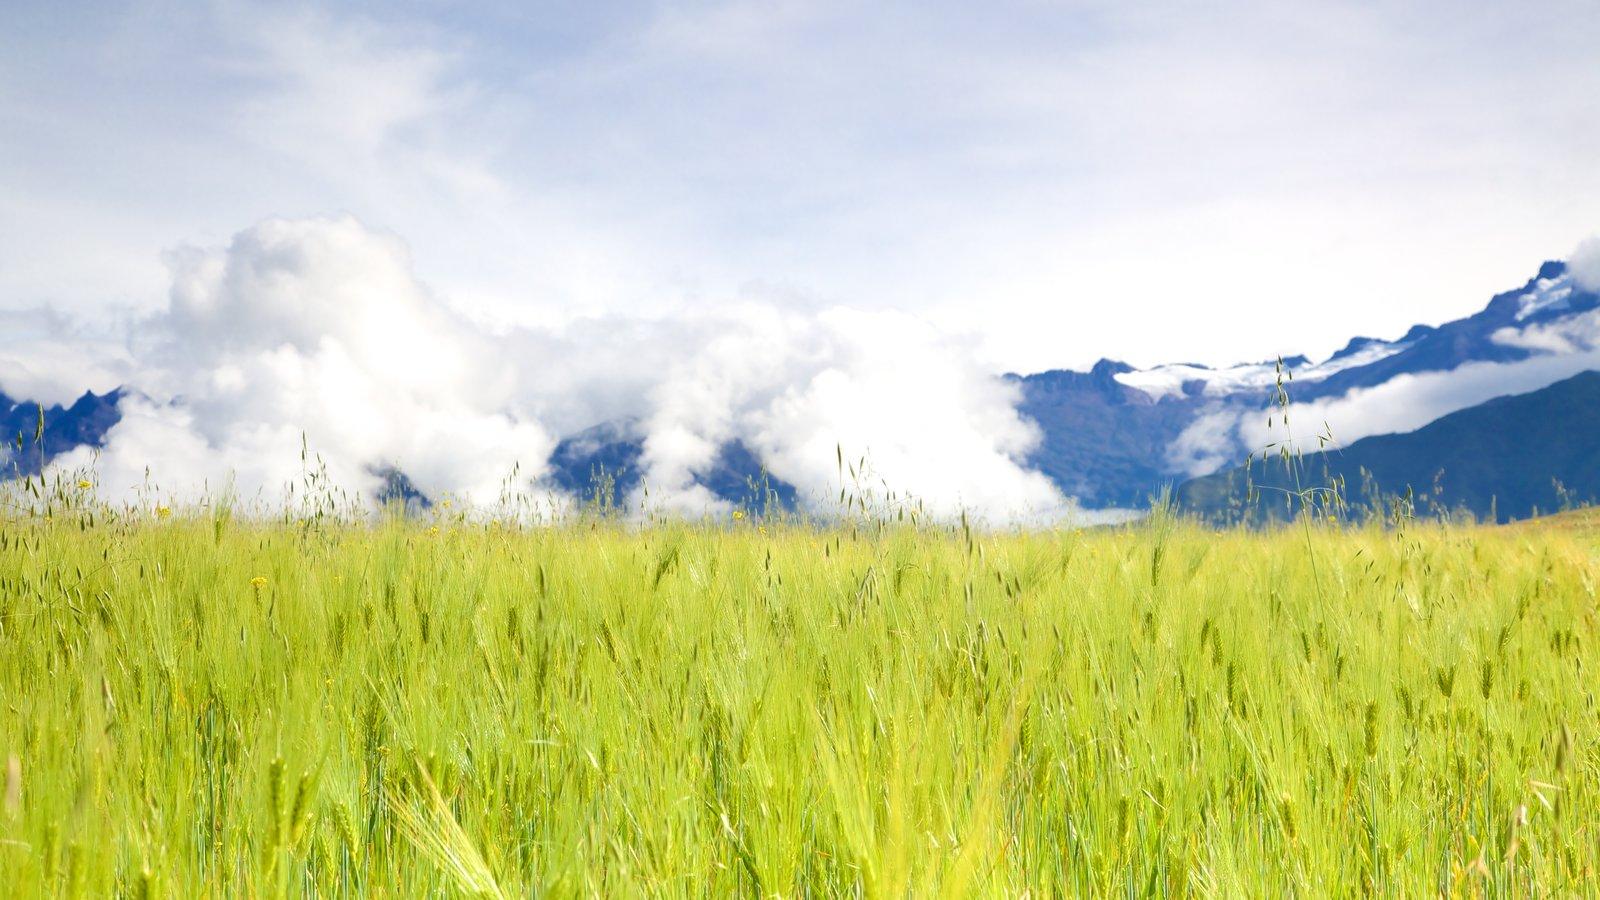 Peru which includes farmland and landscape views